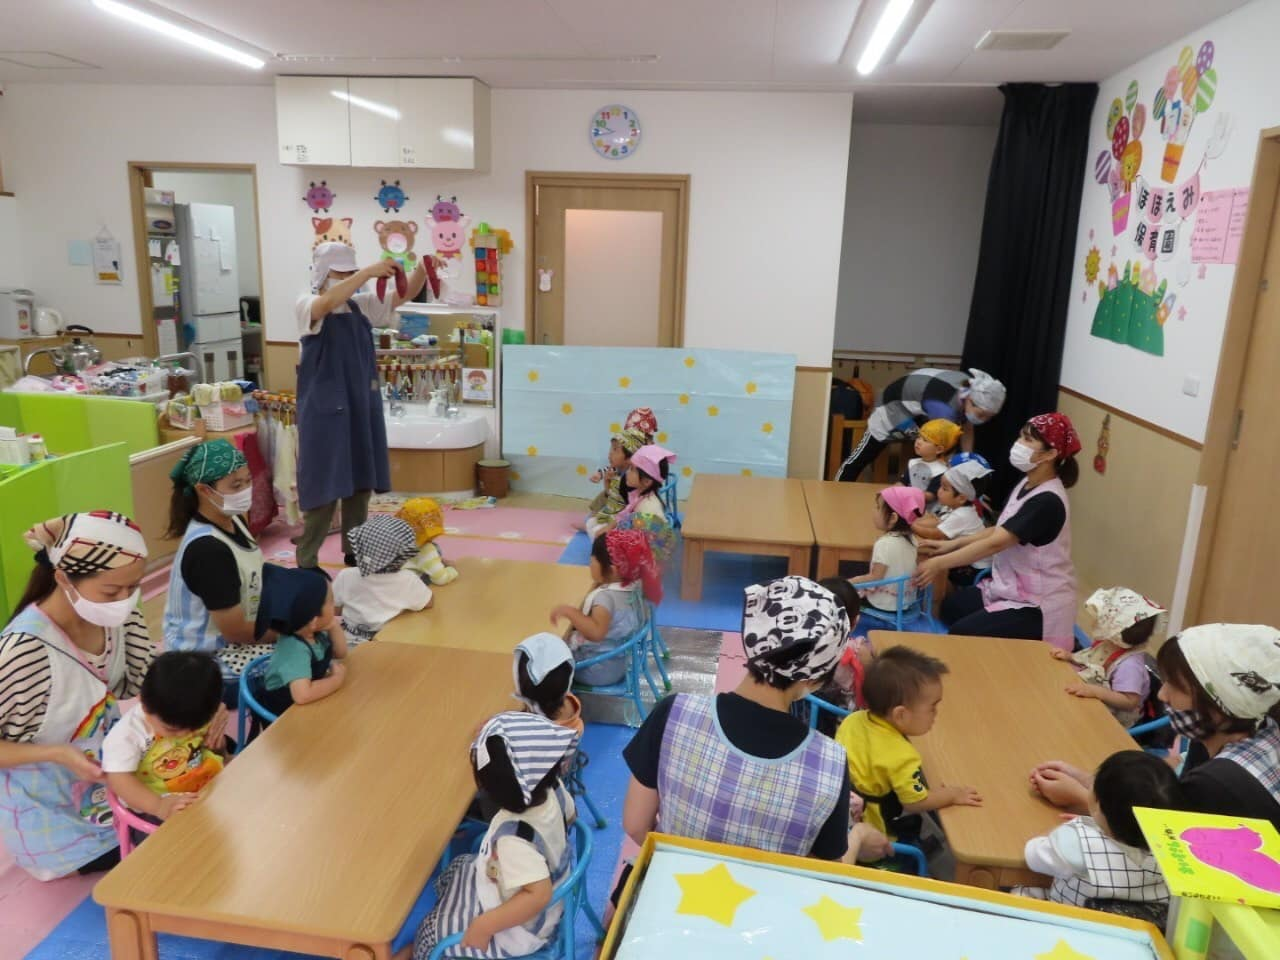 10月食育活動🍠❣️〜長岡京園〜